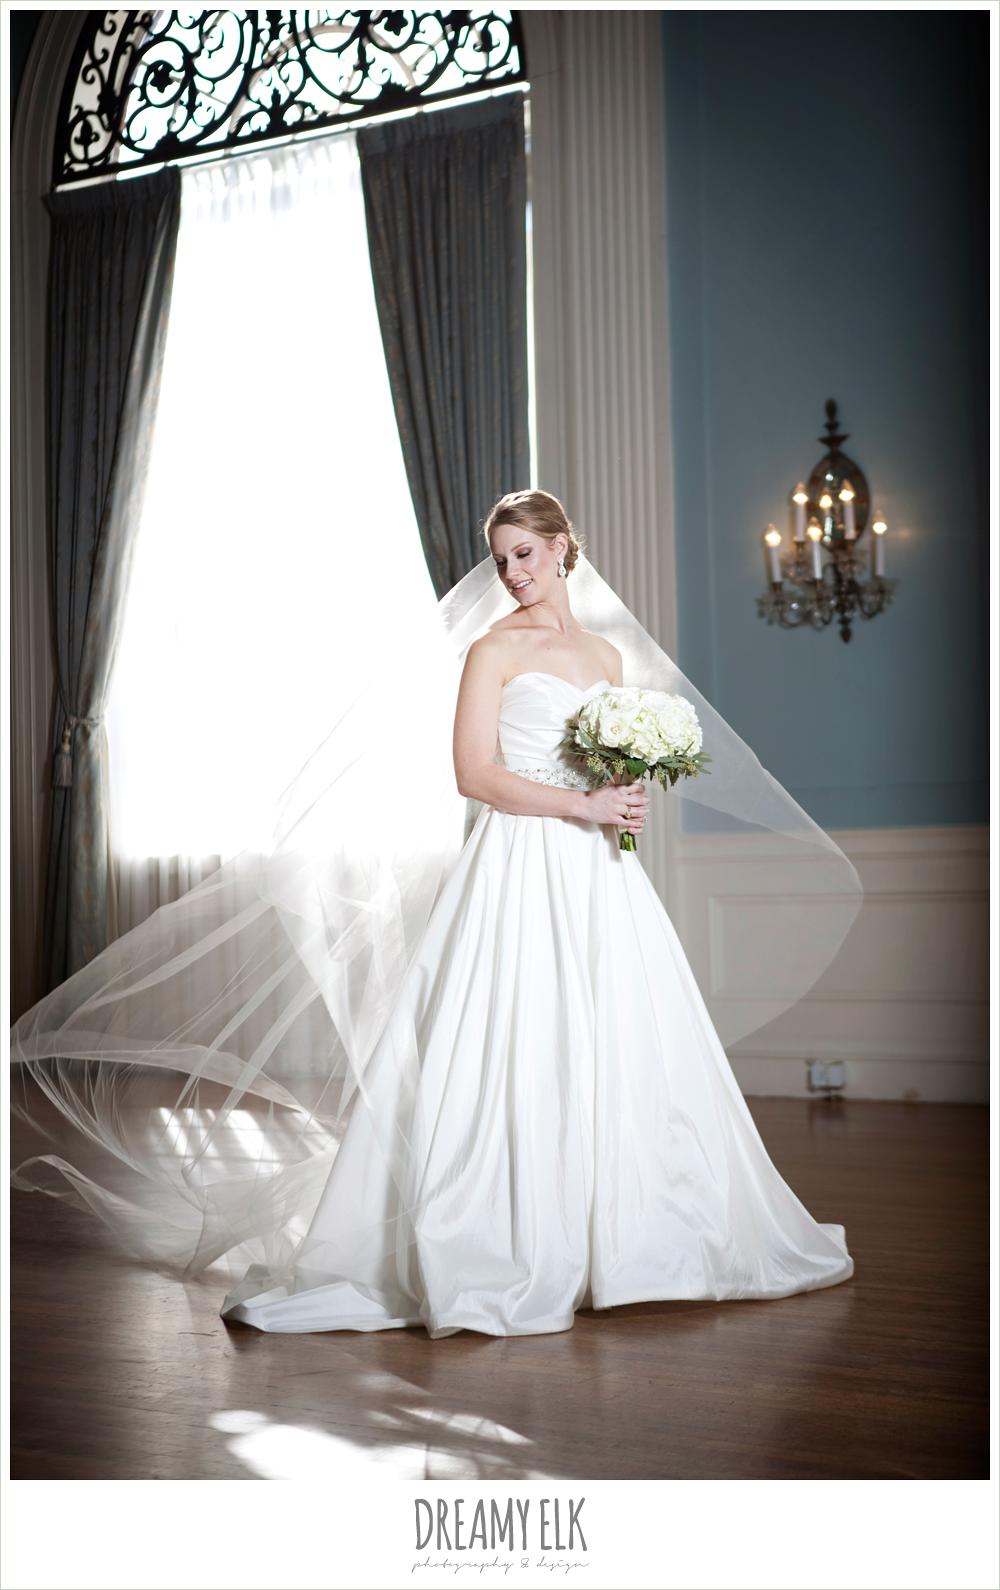 erin, bridal photo contest, texas federation of women's clubs austin